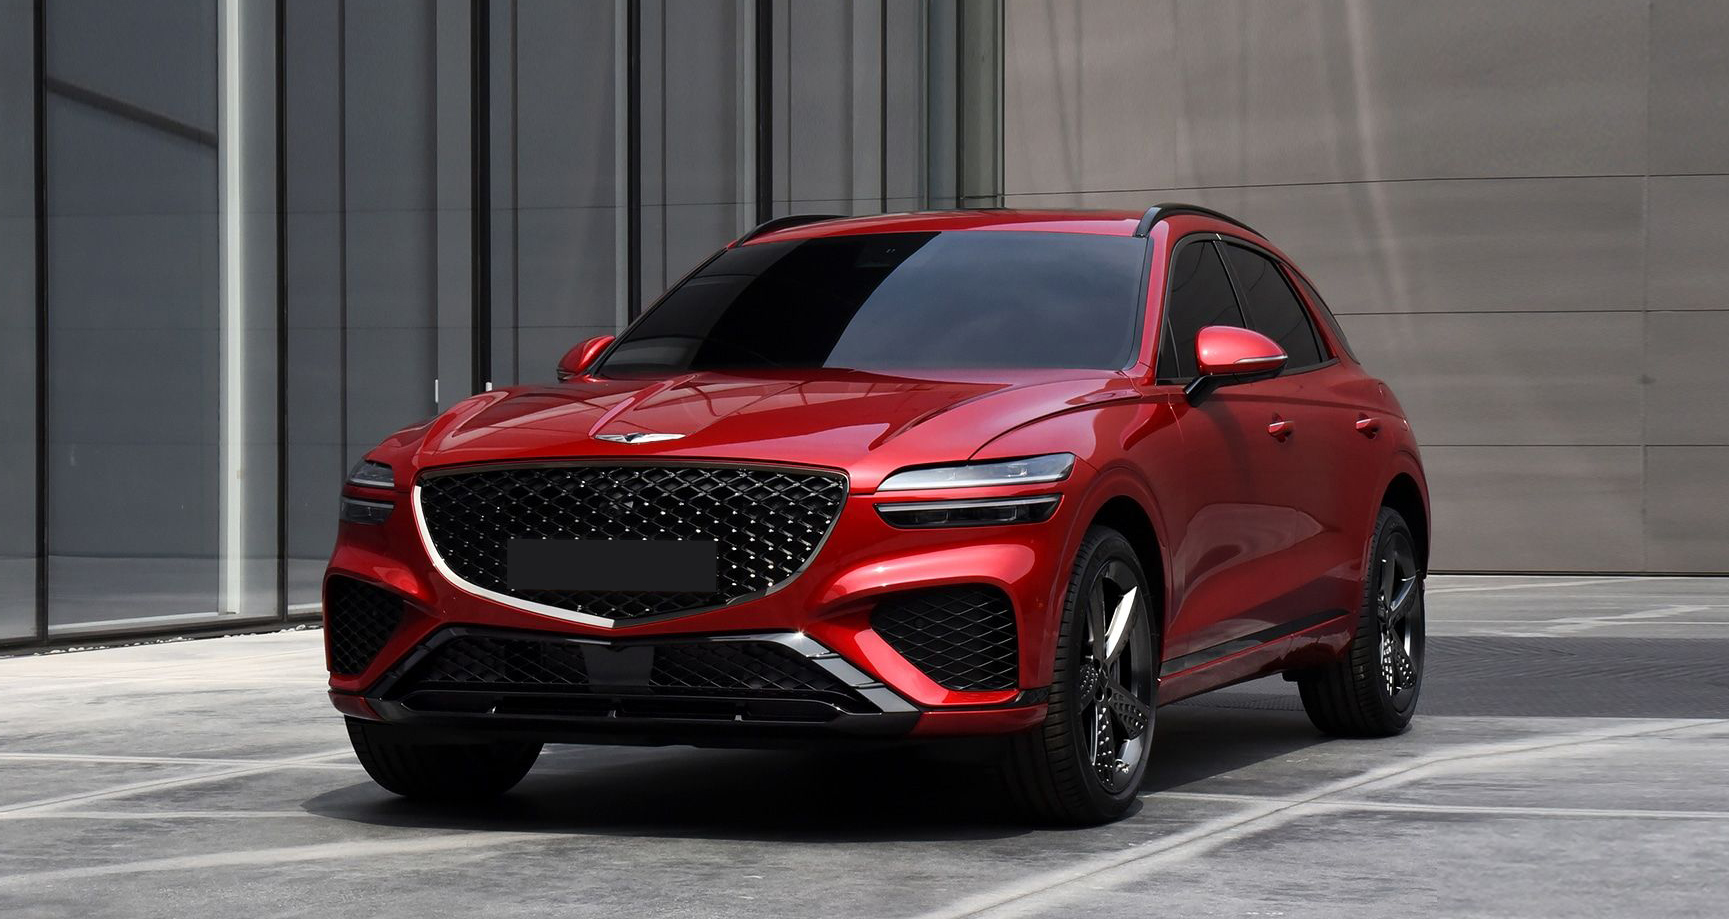 2022 Genesis Gv70 Specs Interior Colors Exterior Colors